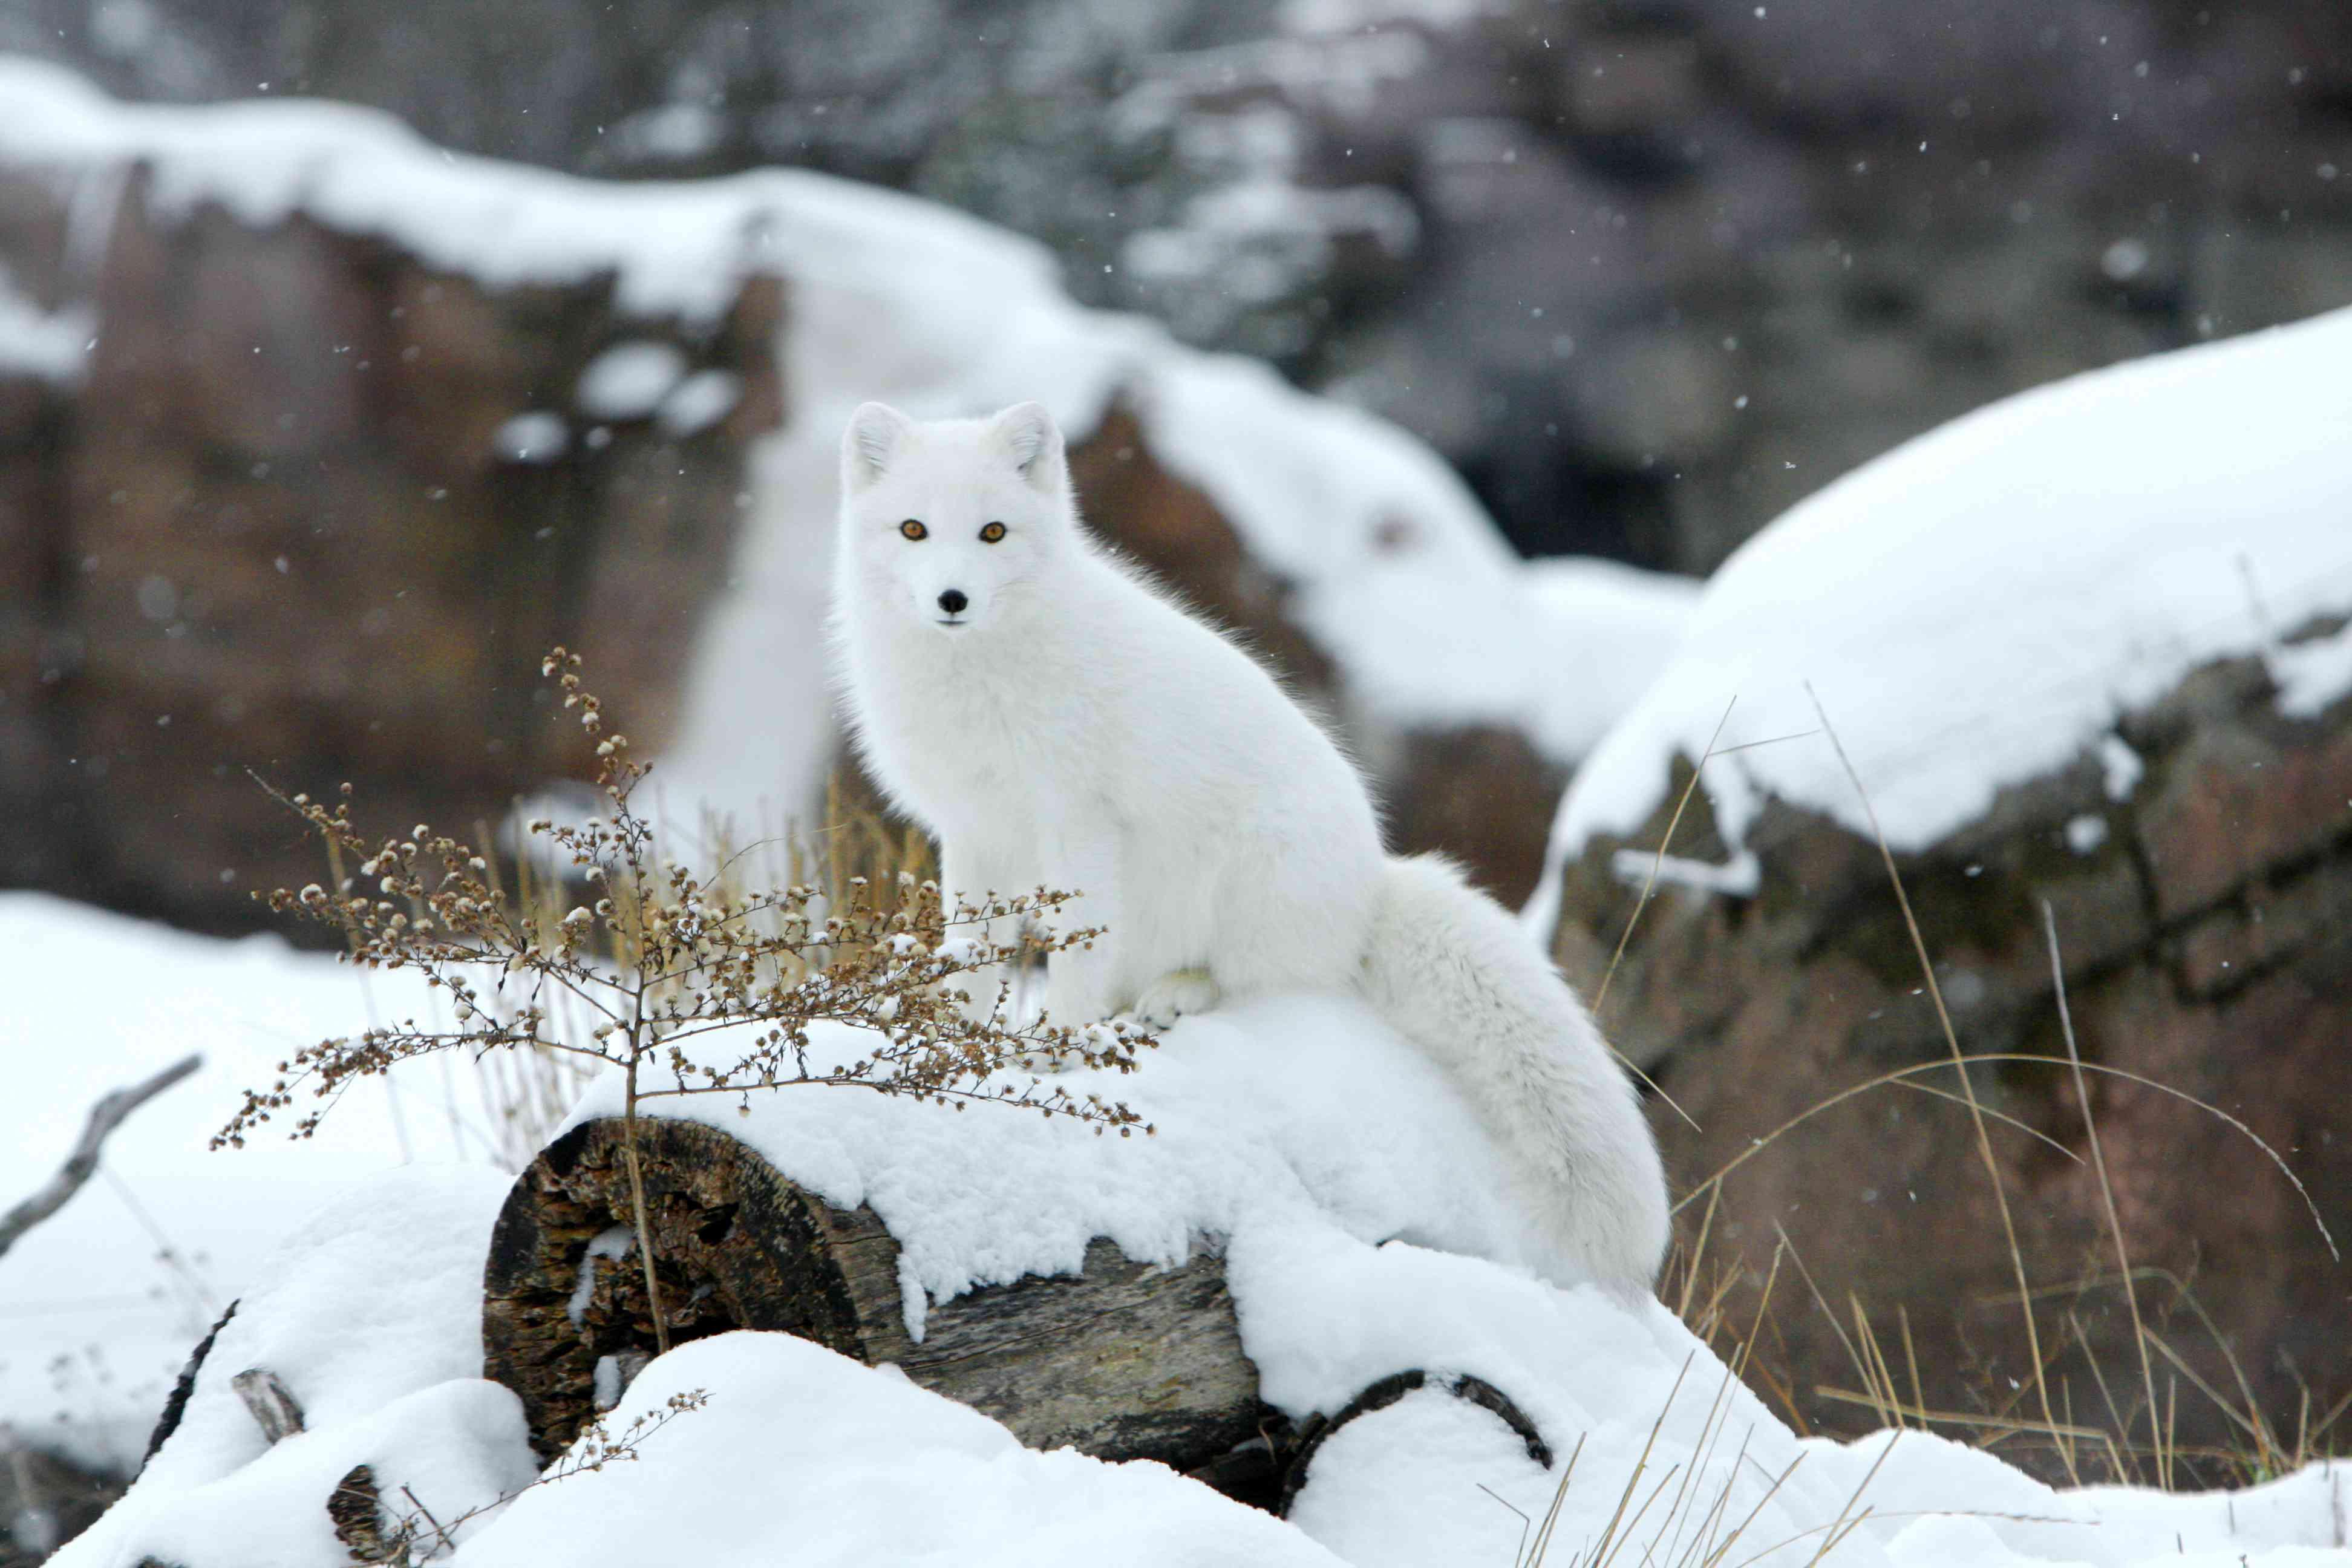 Arctic fox in the snow